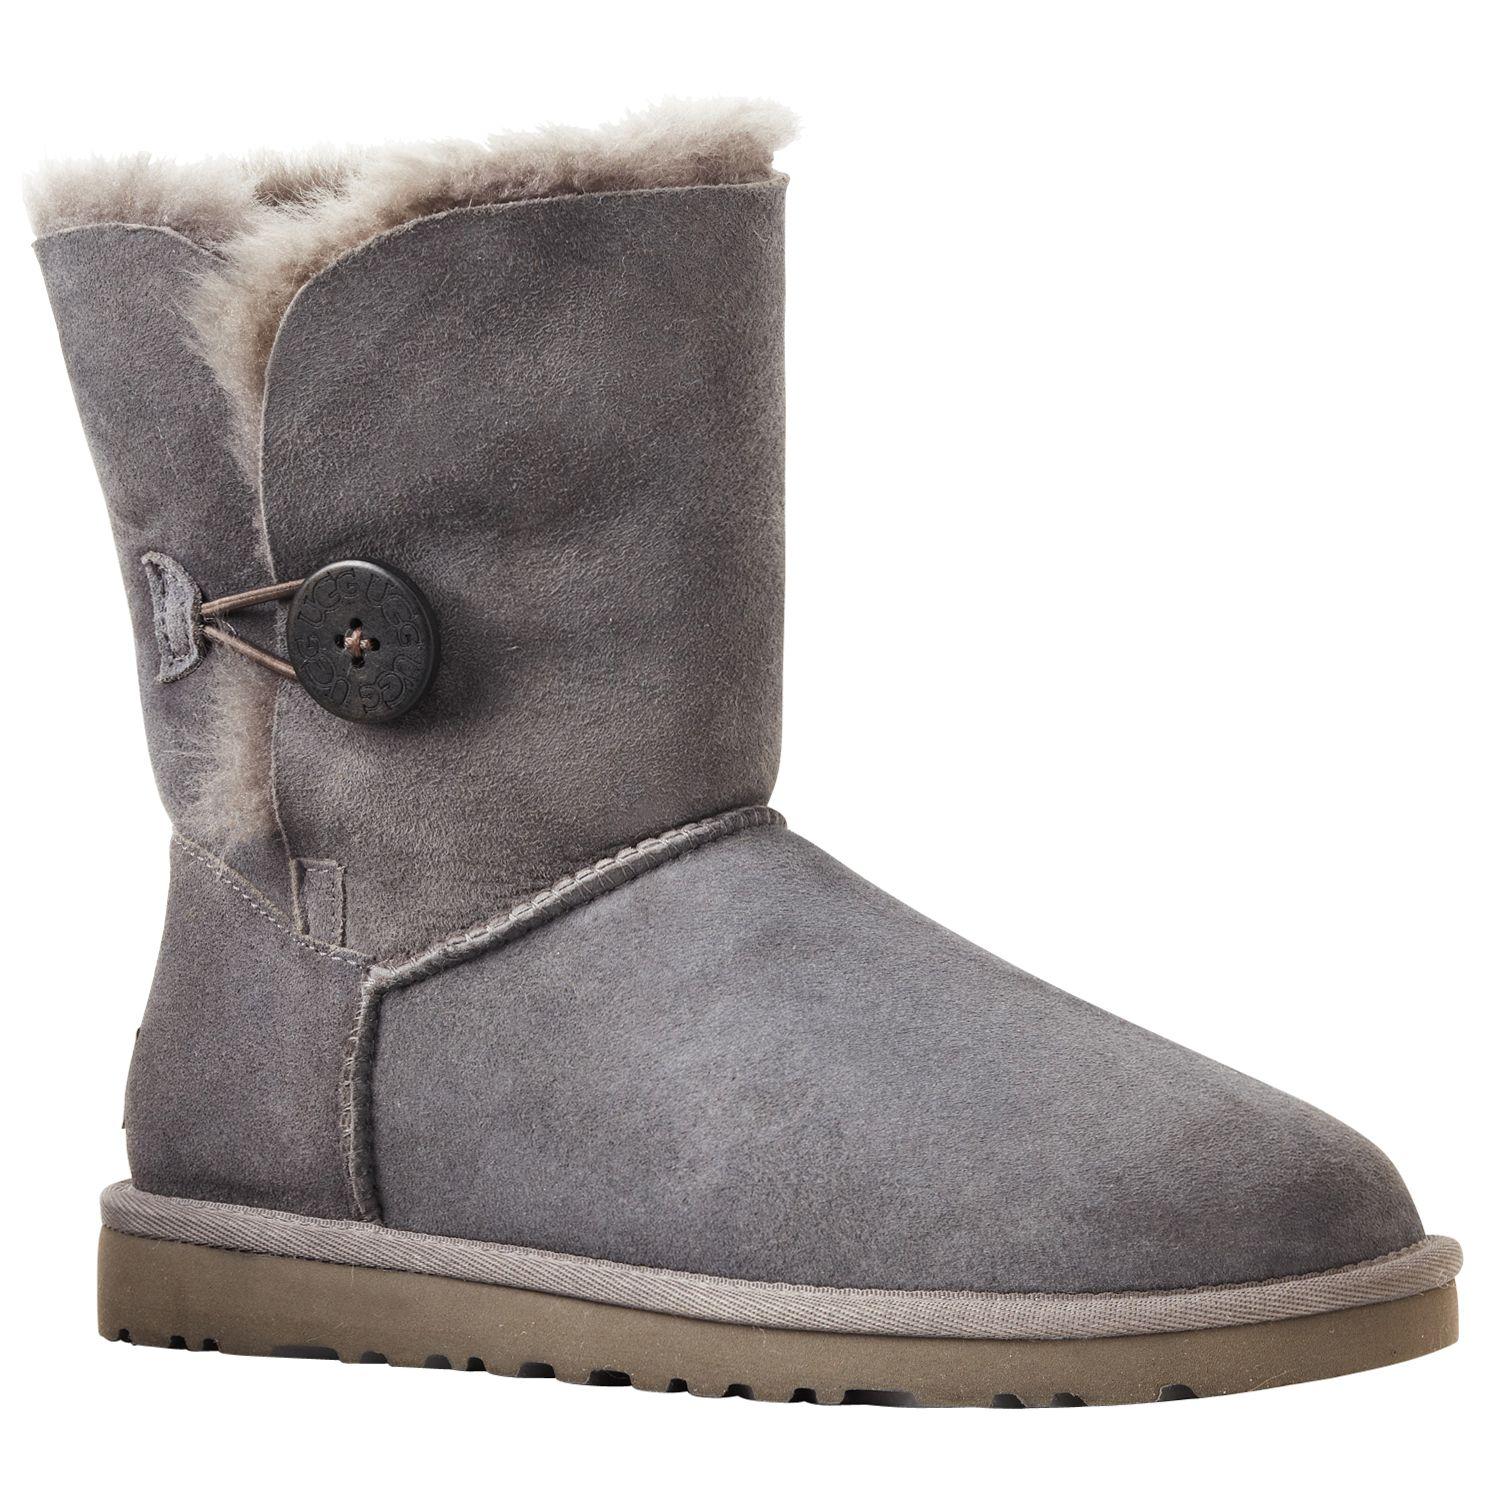 UGG B Button Short Boots, Grey at John Lewis